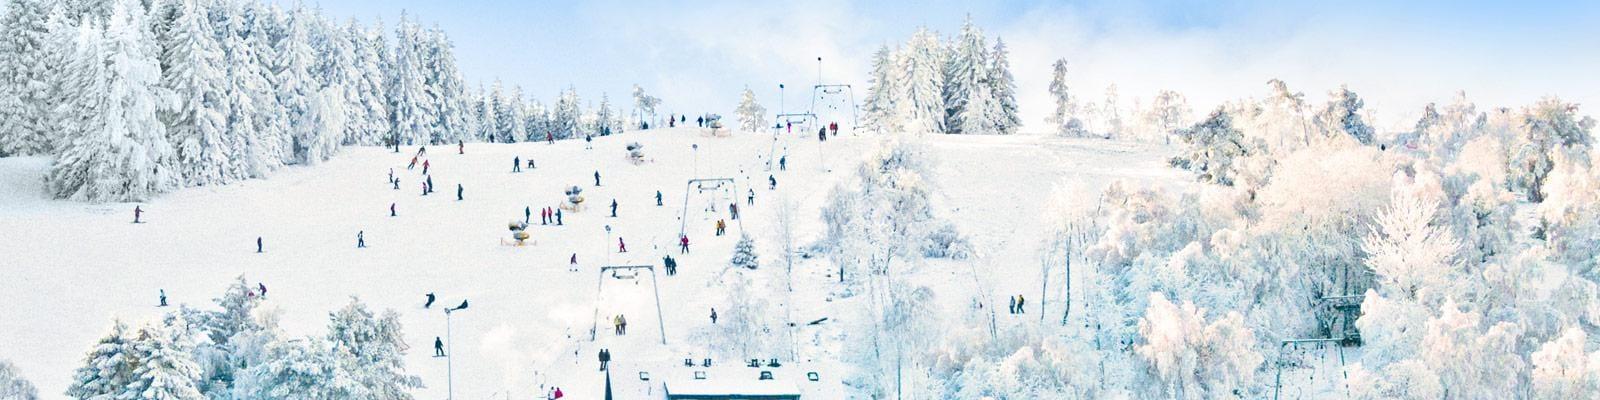 Winterberg wintersport